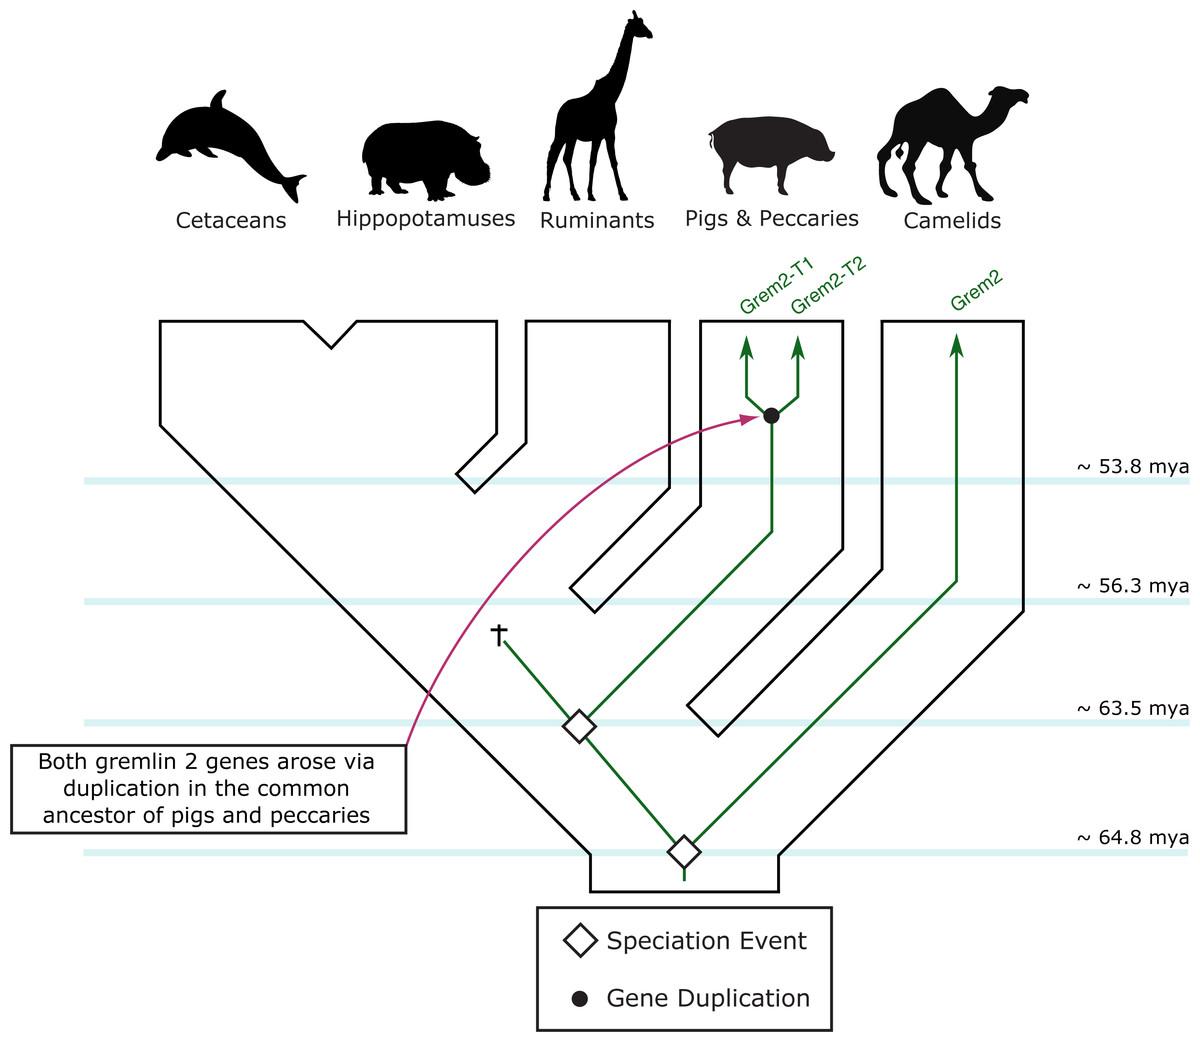 An evolutionary hypothesis regarding the evolution of the gremlin 2 gene in  cetartiodactyl mammals.